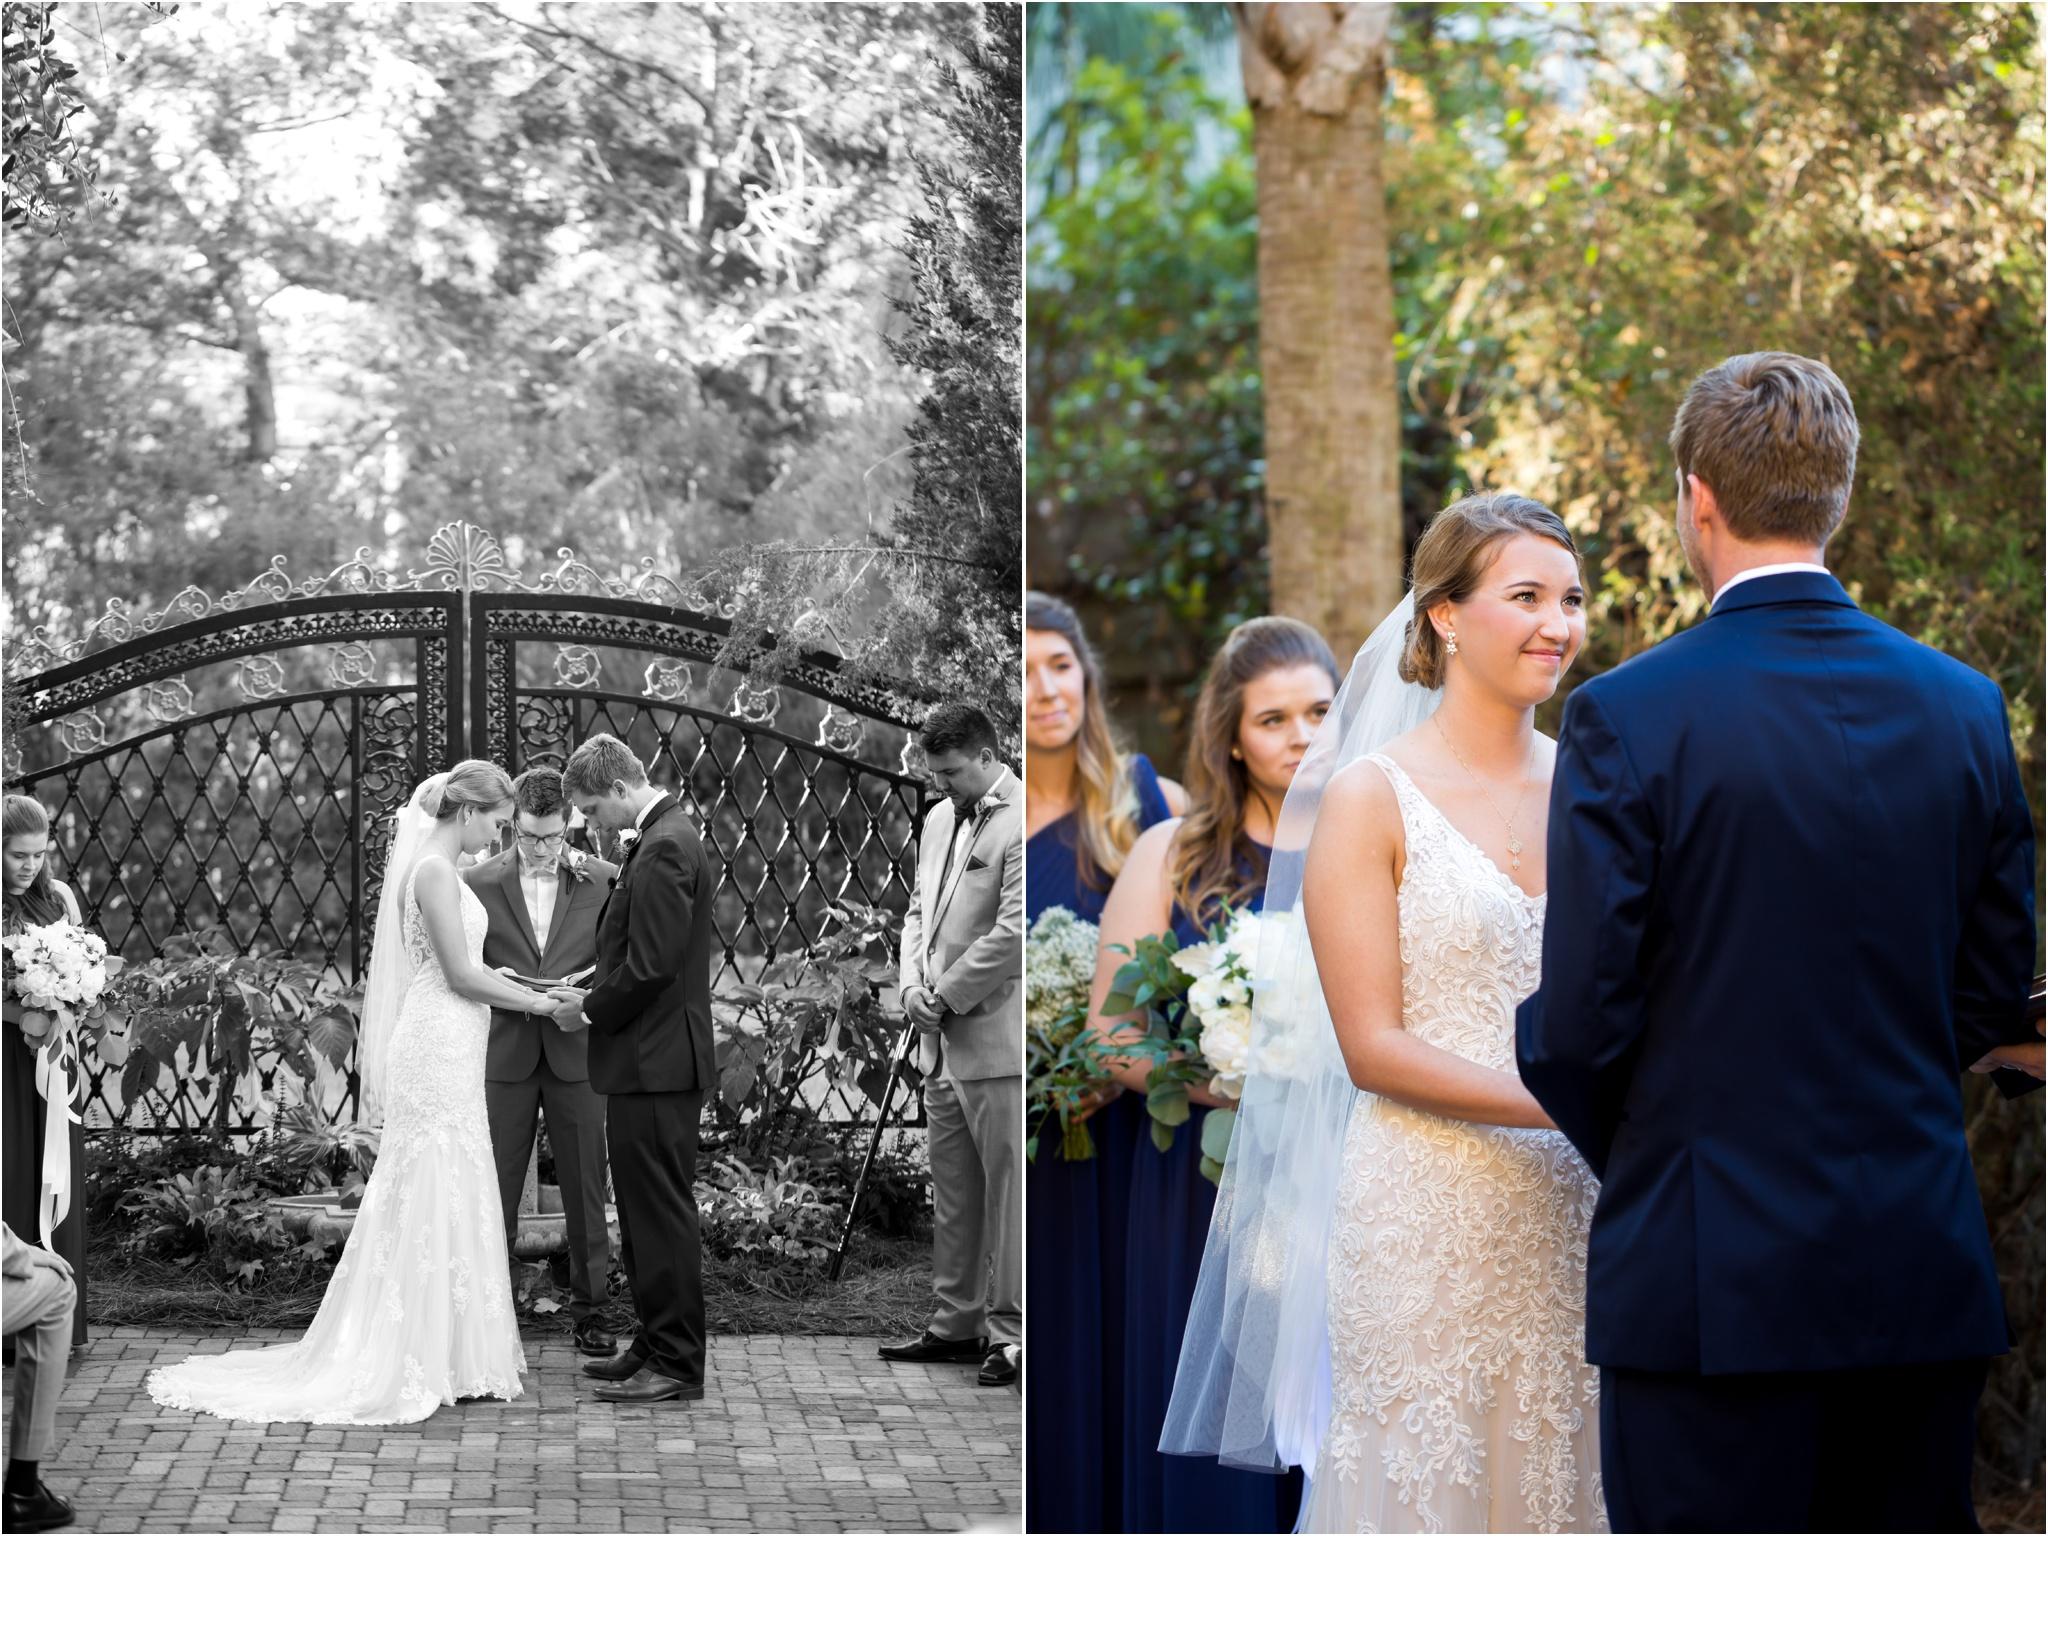 Rainey_Gregg_Photography_St._Simons_Island_Georgia_California_Wedding_Portrait_Photography_0649.jpg